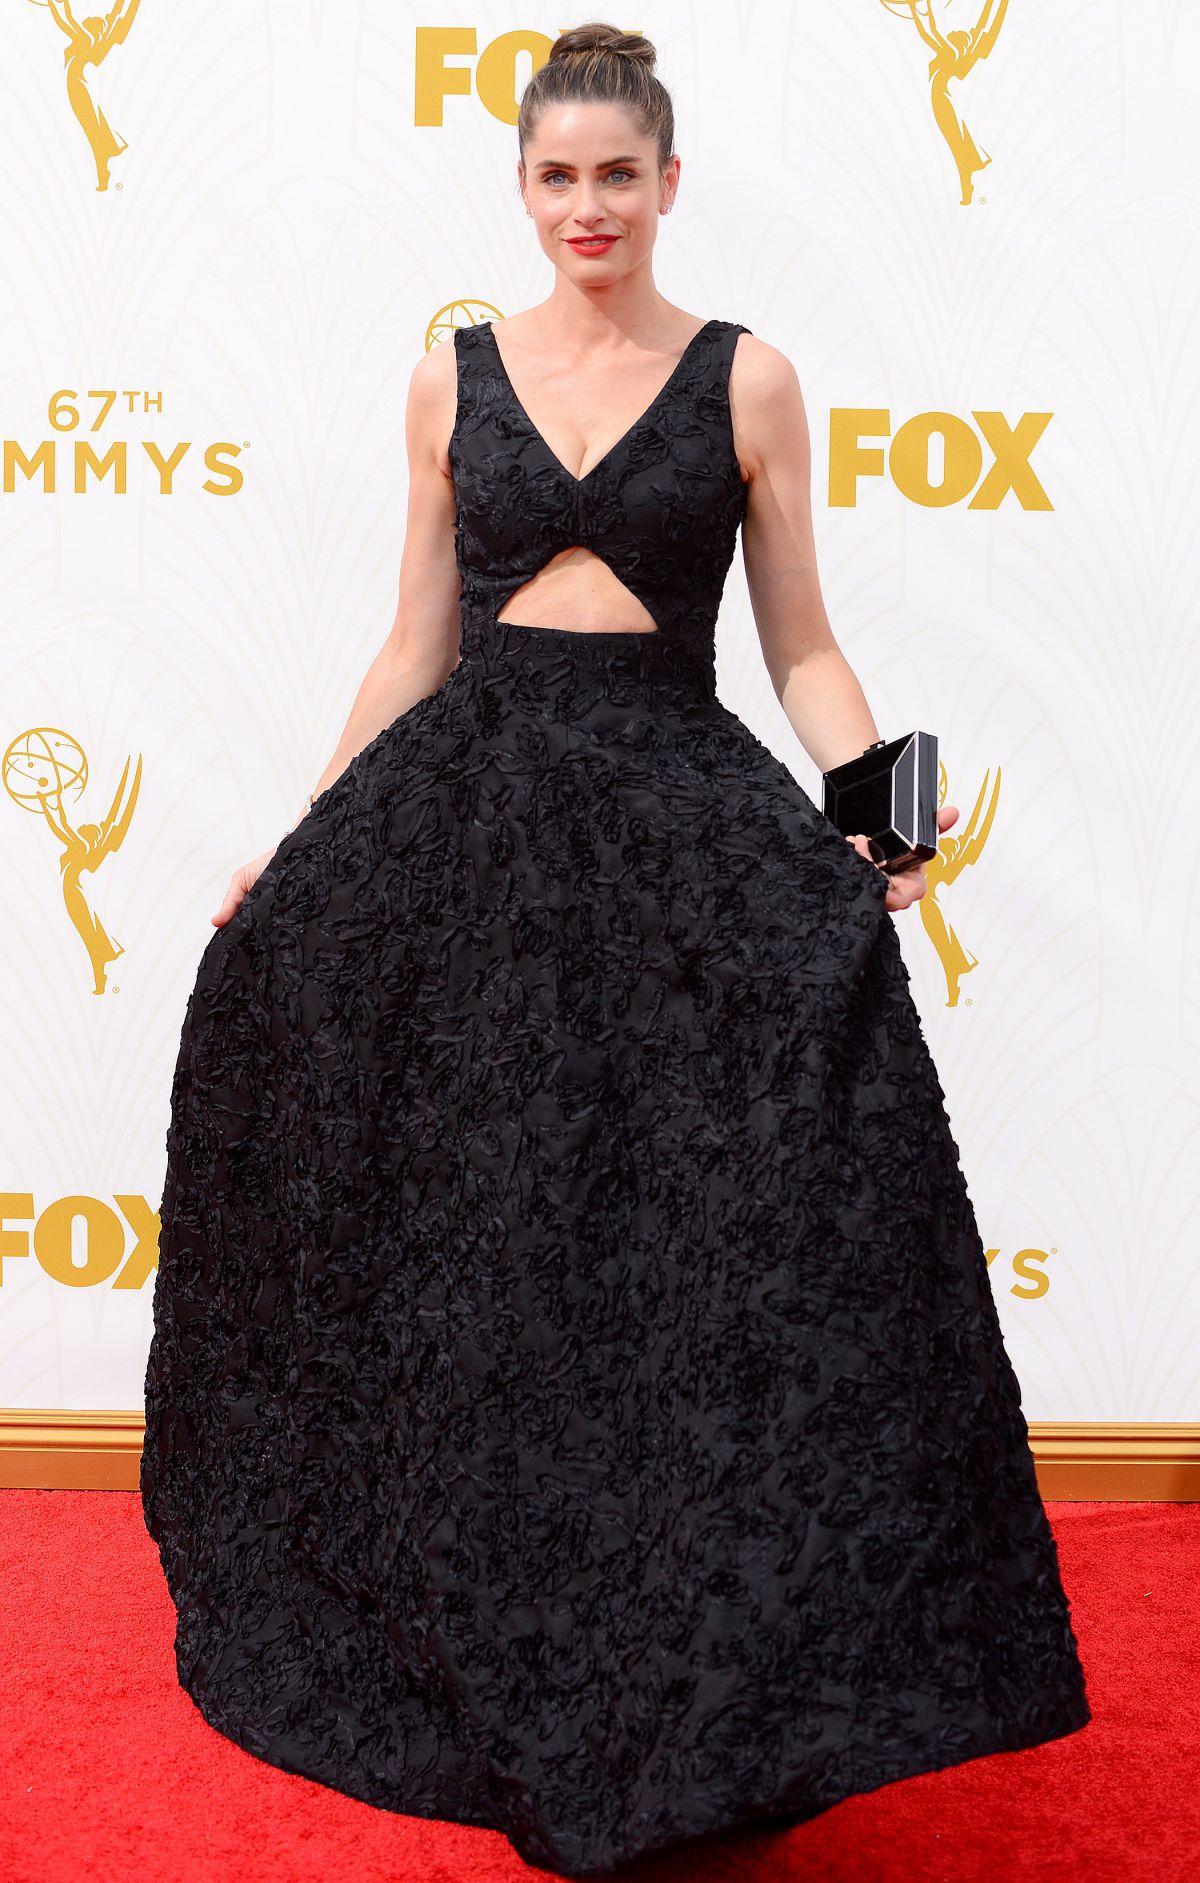 AMANDA PEET at 2015 Emmy Awards in Los Angeles 09/20/2015